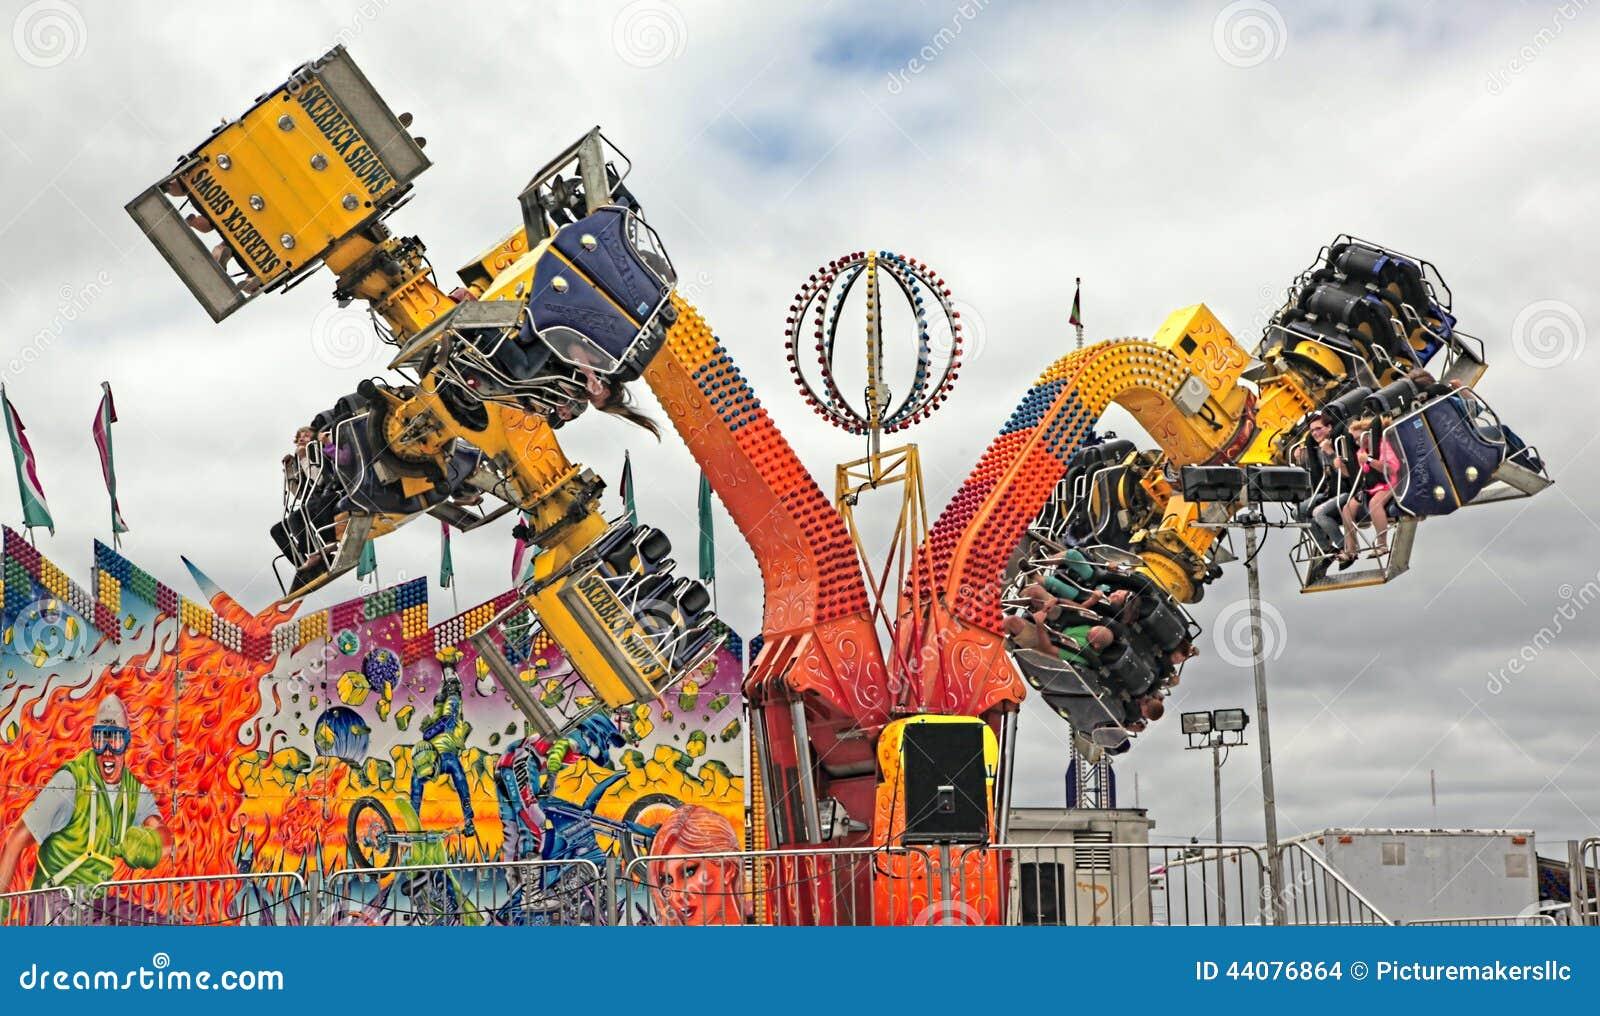 State Fair Carnival Rides, Michigan Editorial Stock Image - Image ...